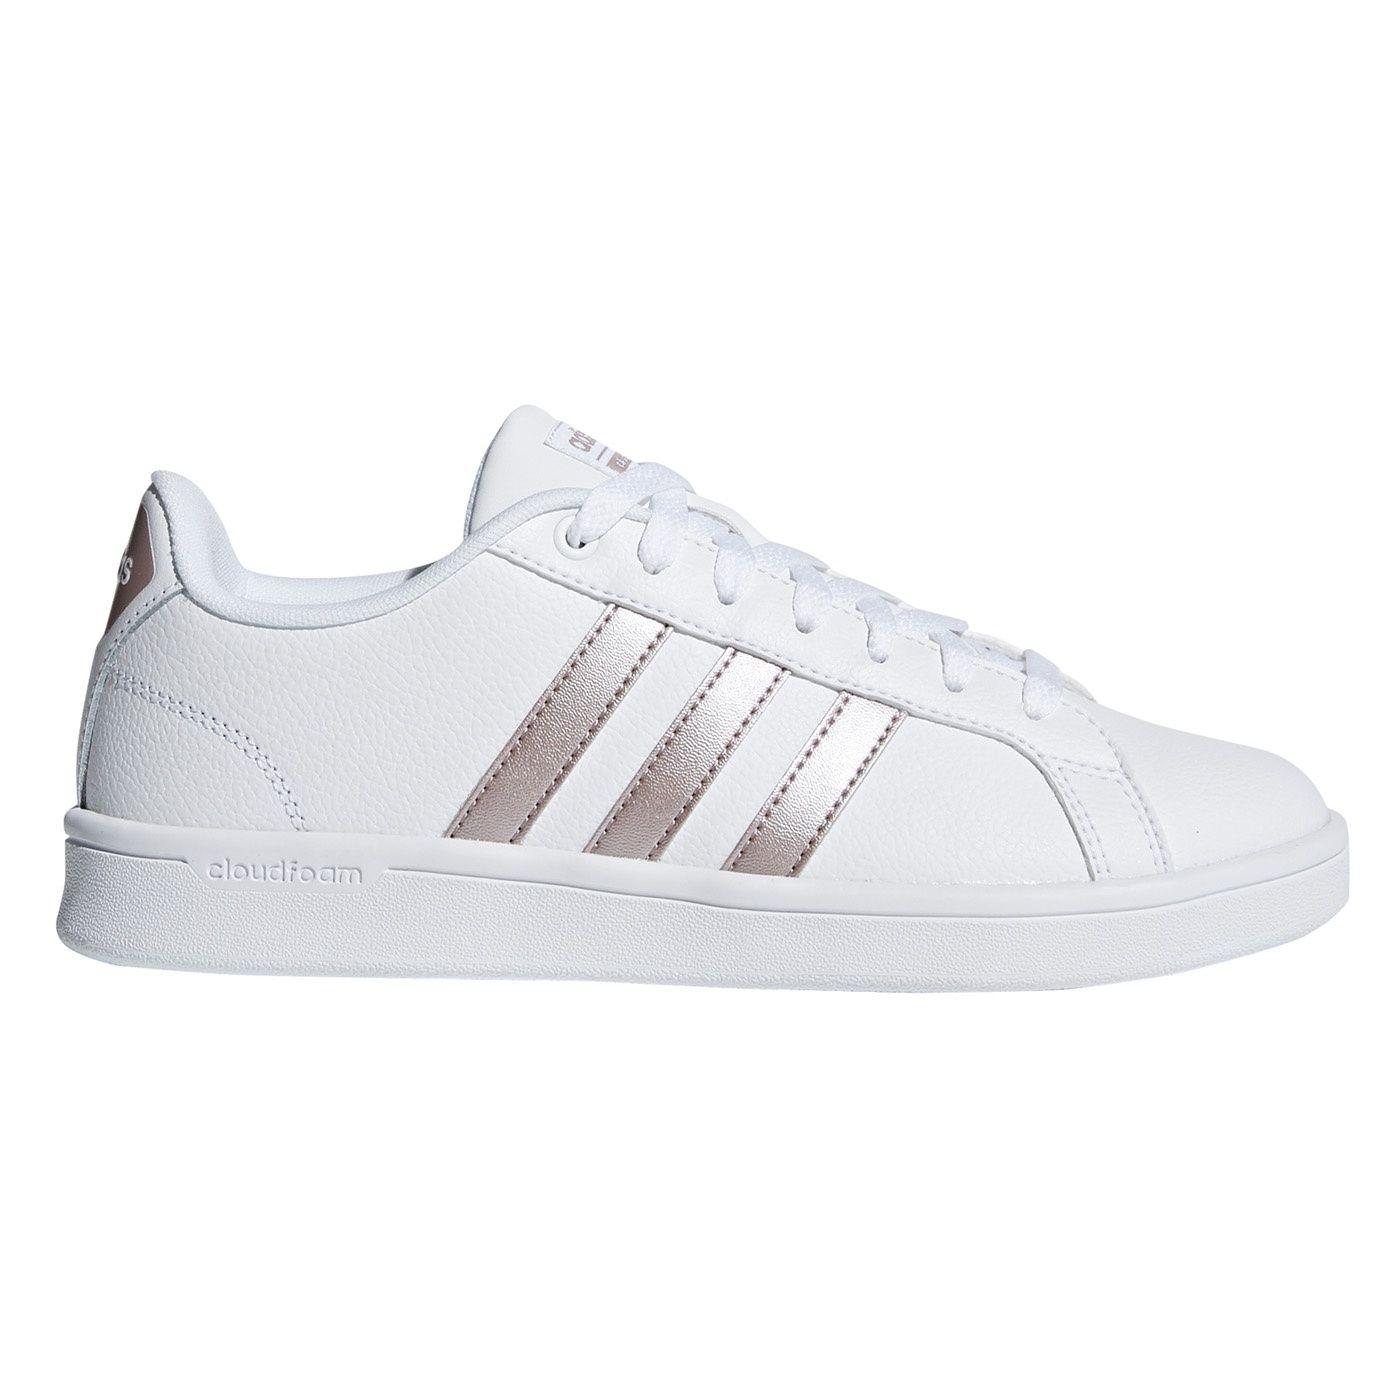 Damskie Buty Do Tenisa Cf Advantage Da9524 Adidas Internetowy Sklep Sportowy Martes Sport Adidas Adidas Sneakers Adidas Superstar Sneaker